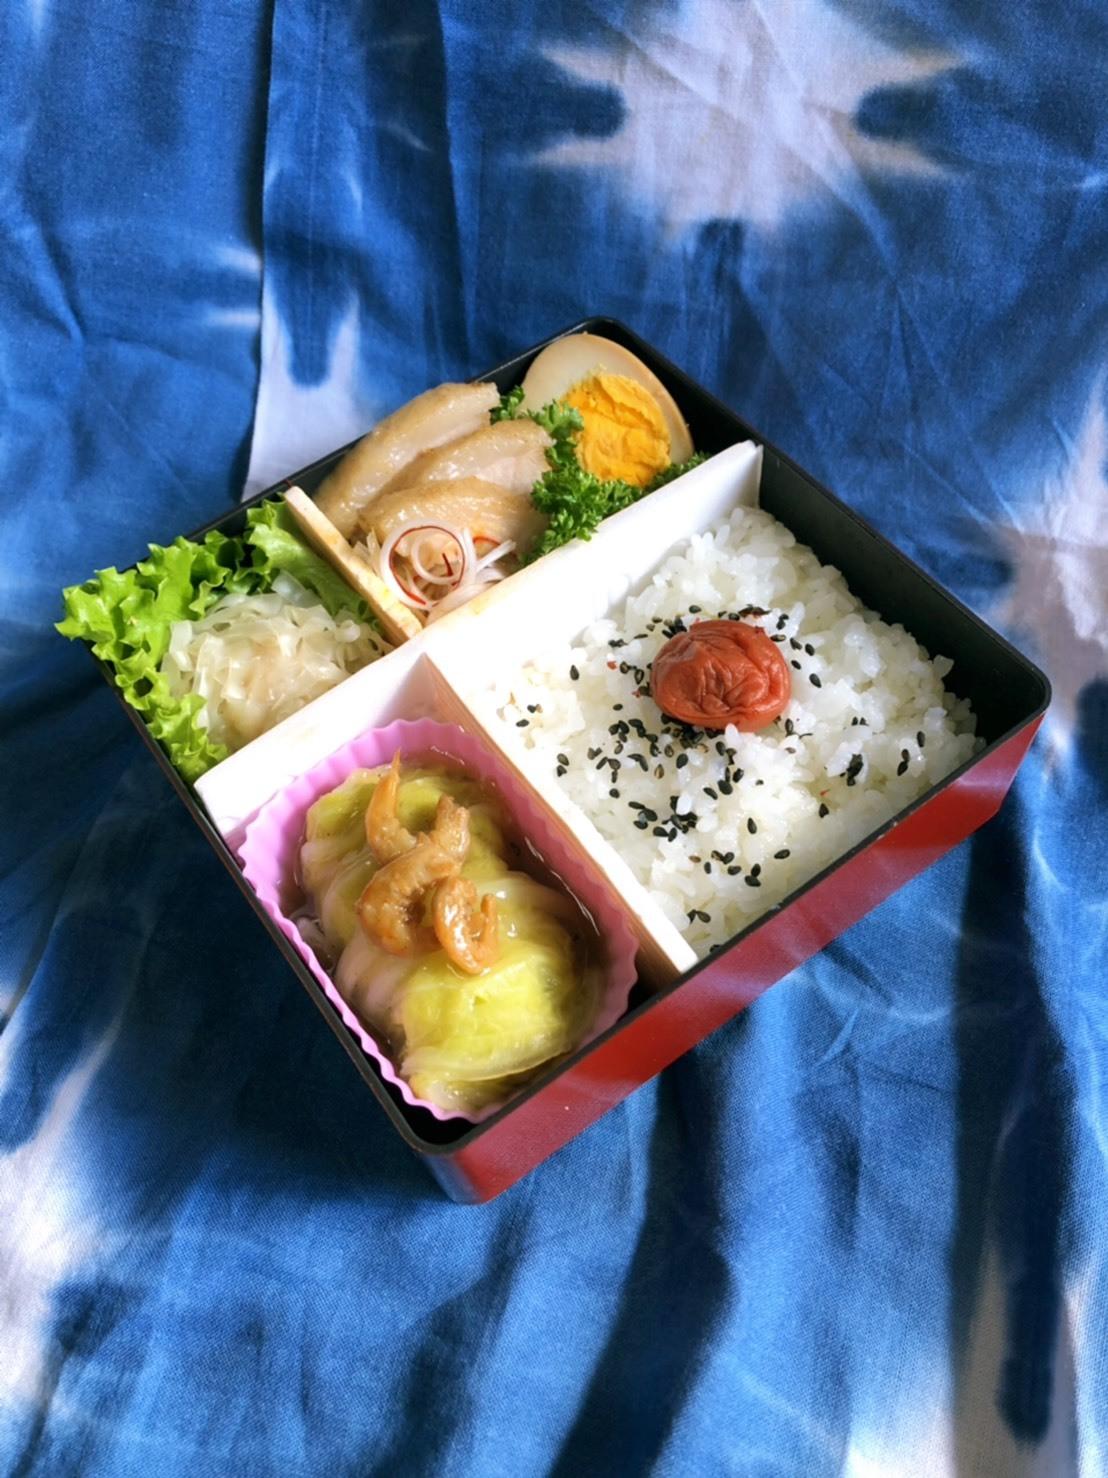 Saturday Lunch Boxes & インスタ_b0376788_12303816.jpg